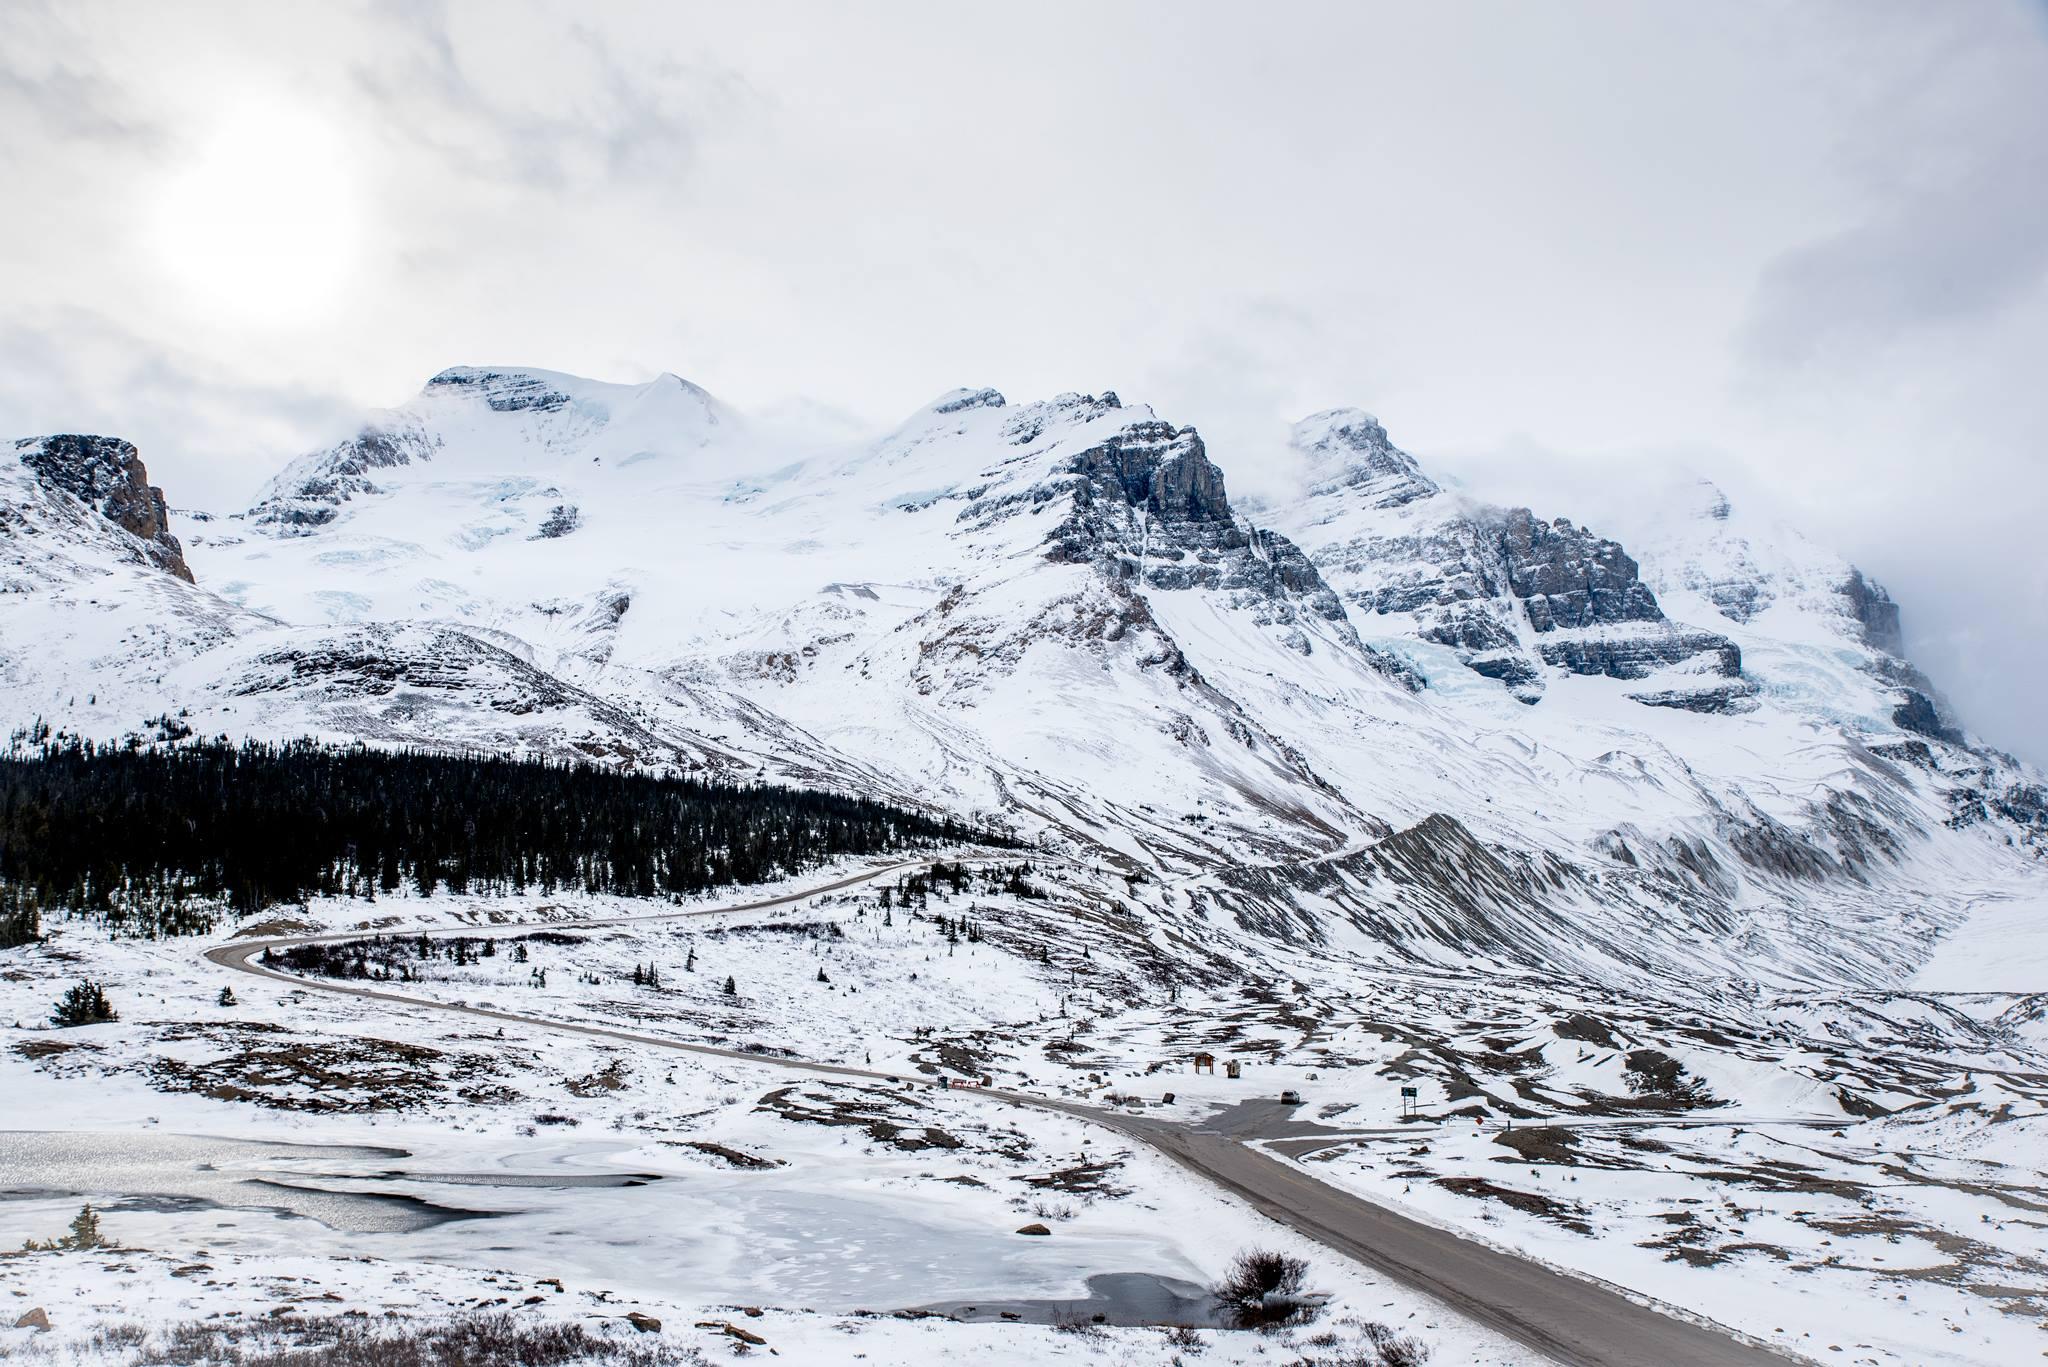 Icefields Parkway, Alberta